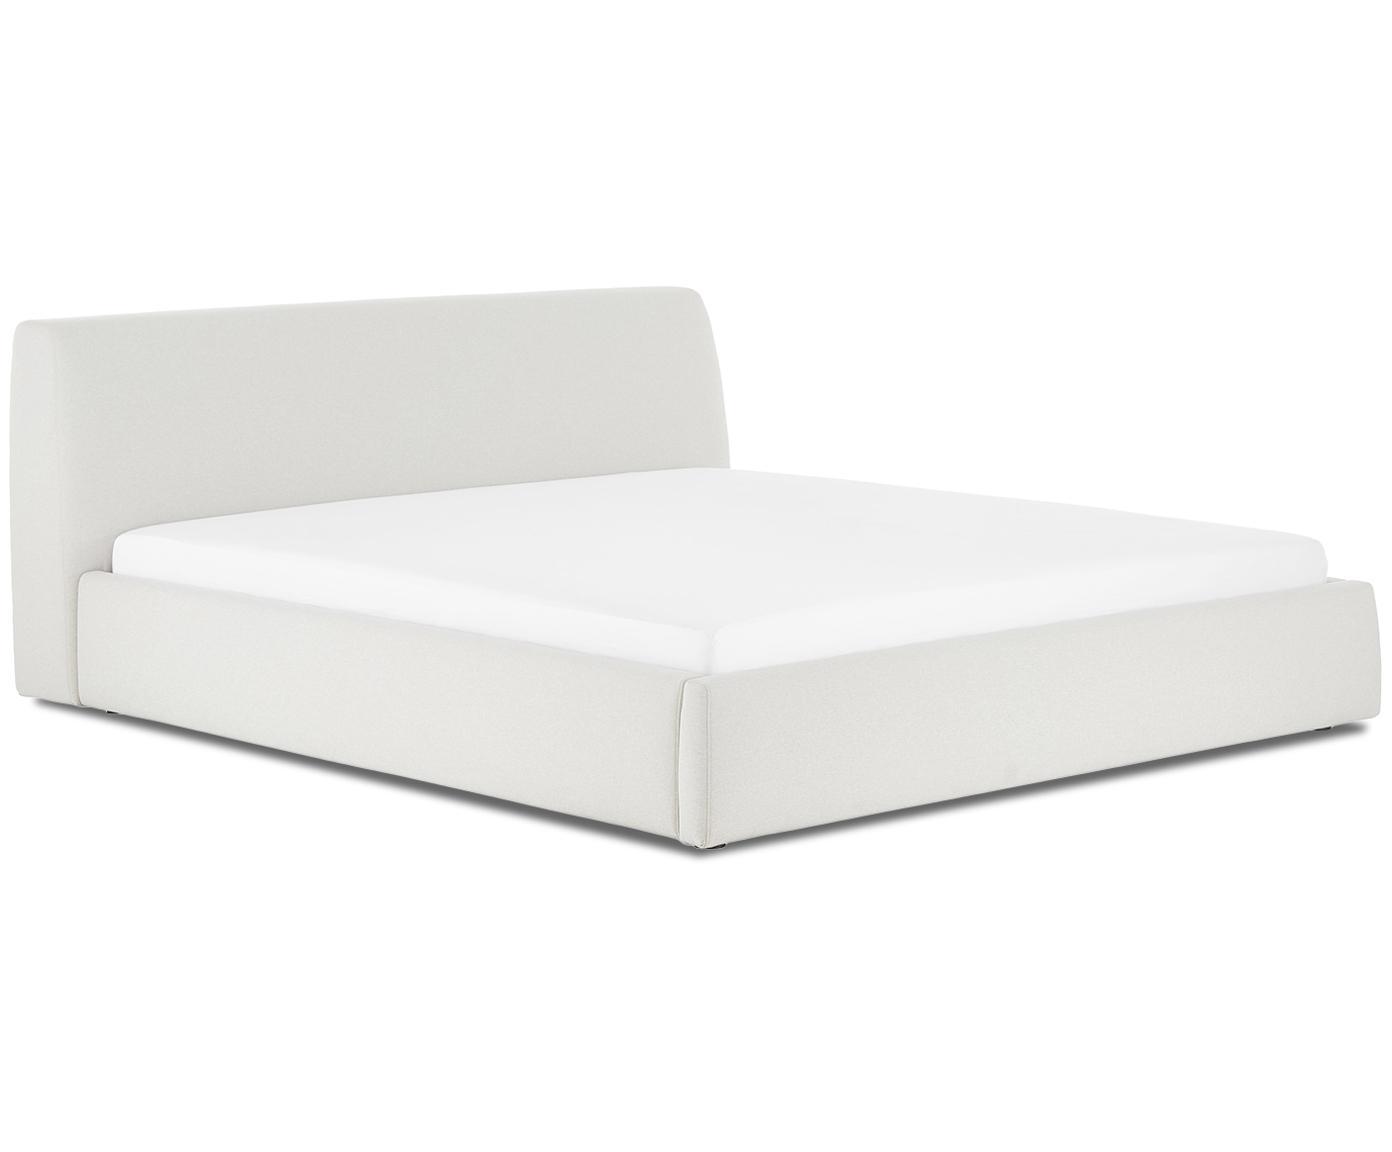 Gestoffeerd bed Cloud, Frame: massief grenenhout, Bekleding: polyester (structuurmater, Beige, 160 x 200 cm